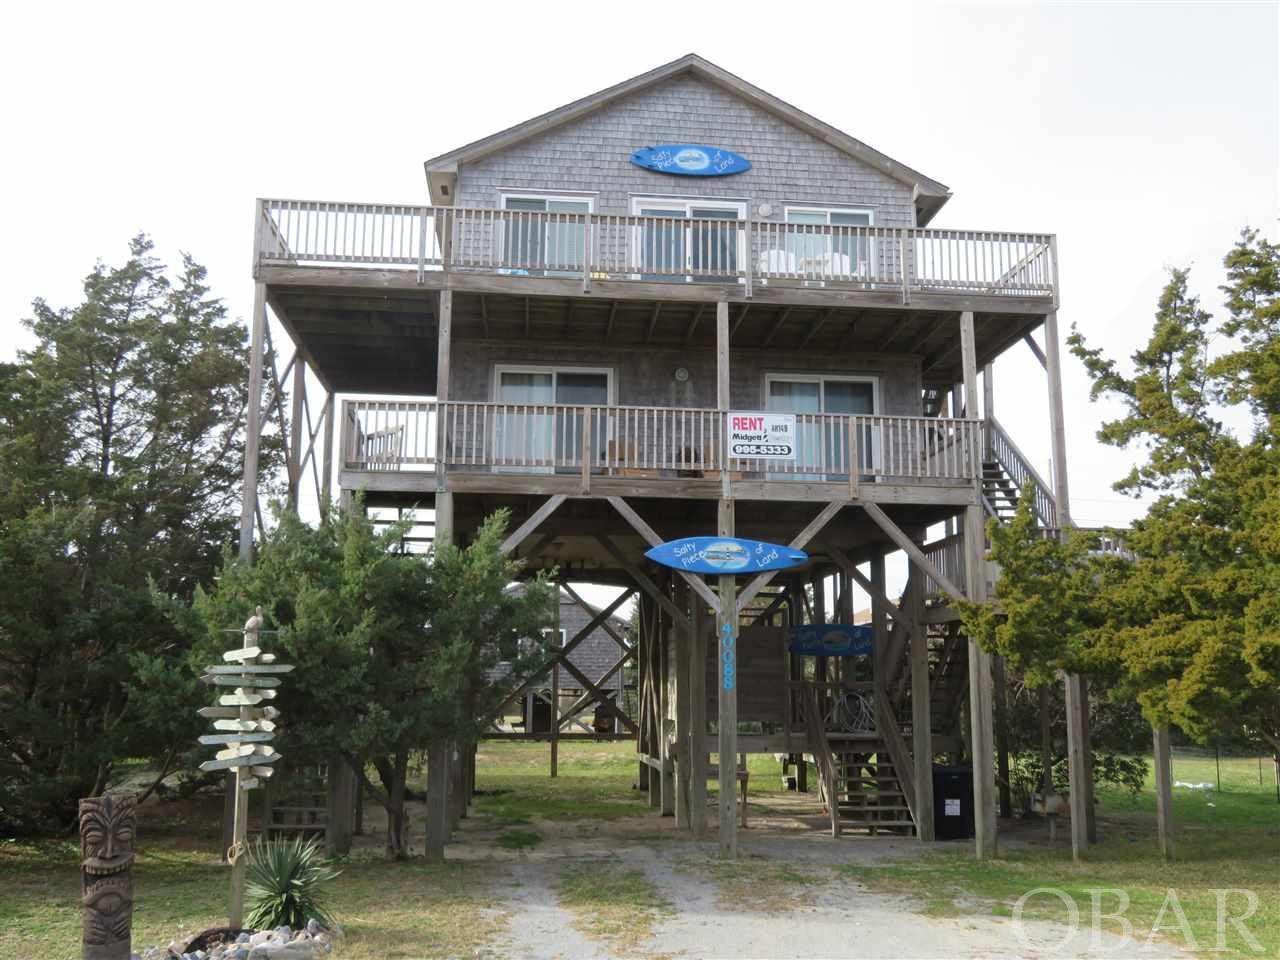 40088 Marlin Drive Lot 149, Avon, NC 27915